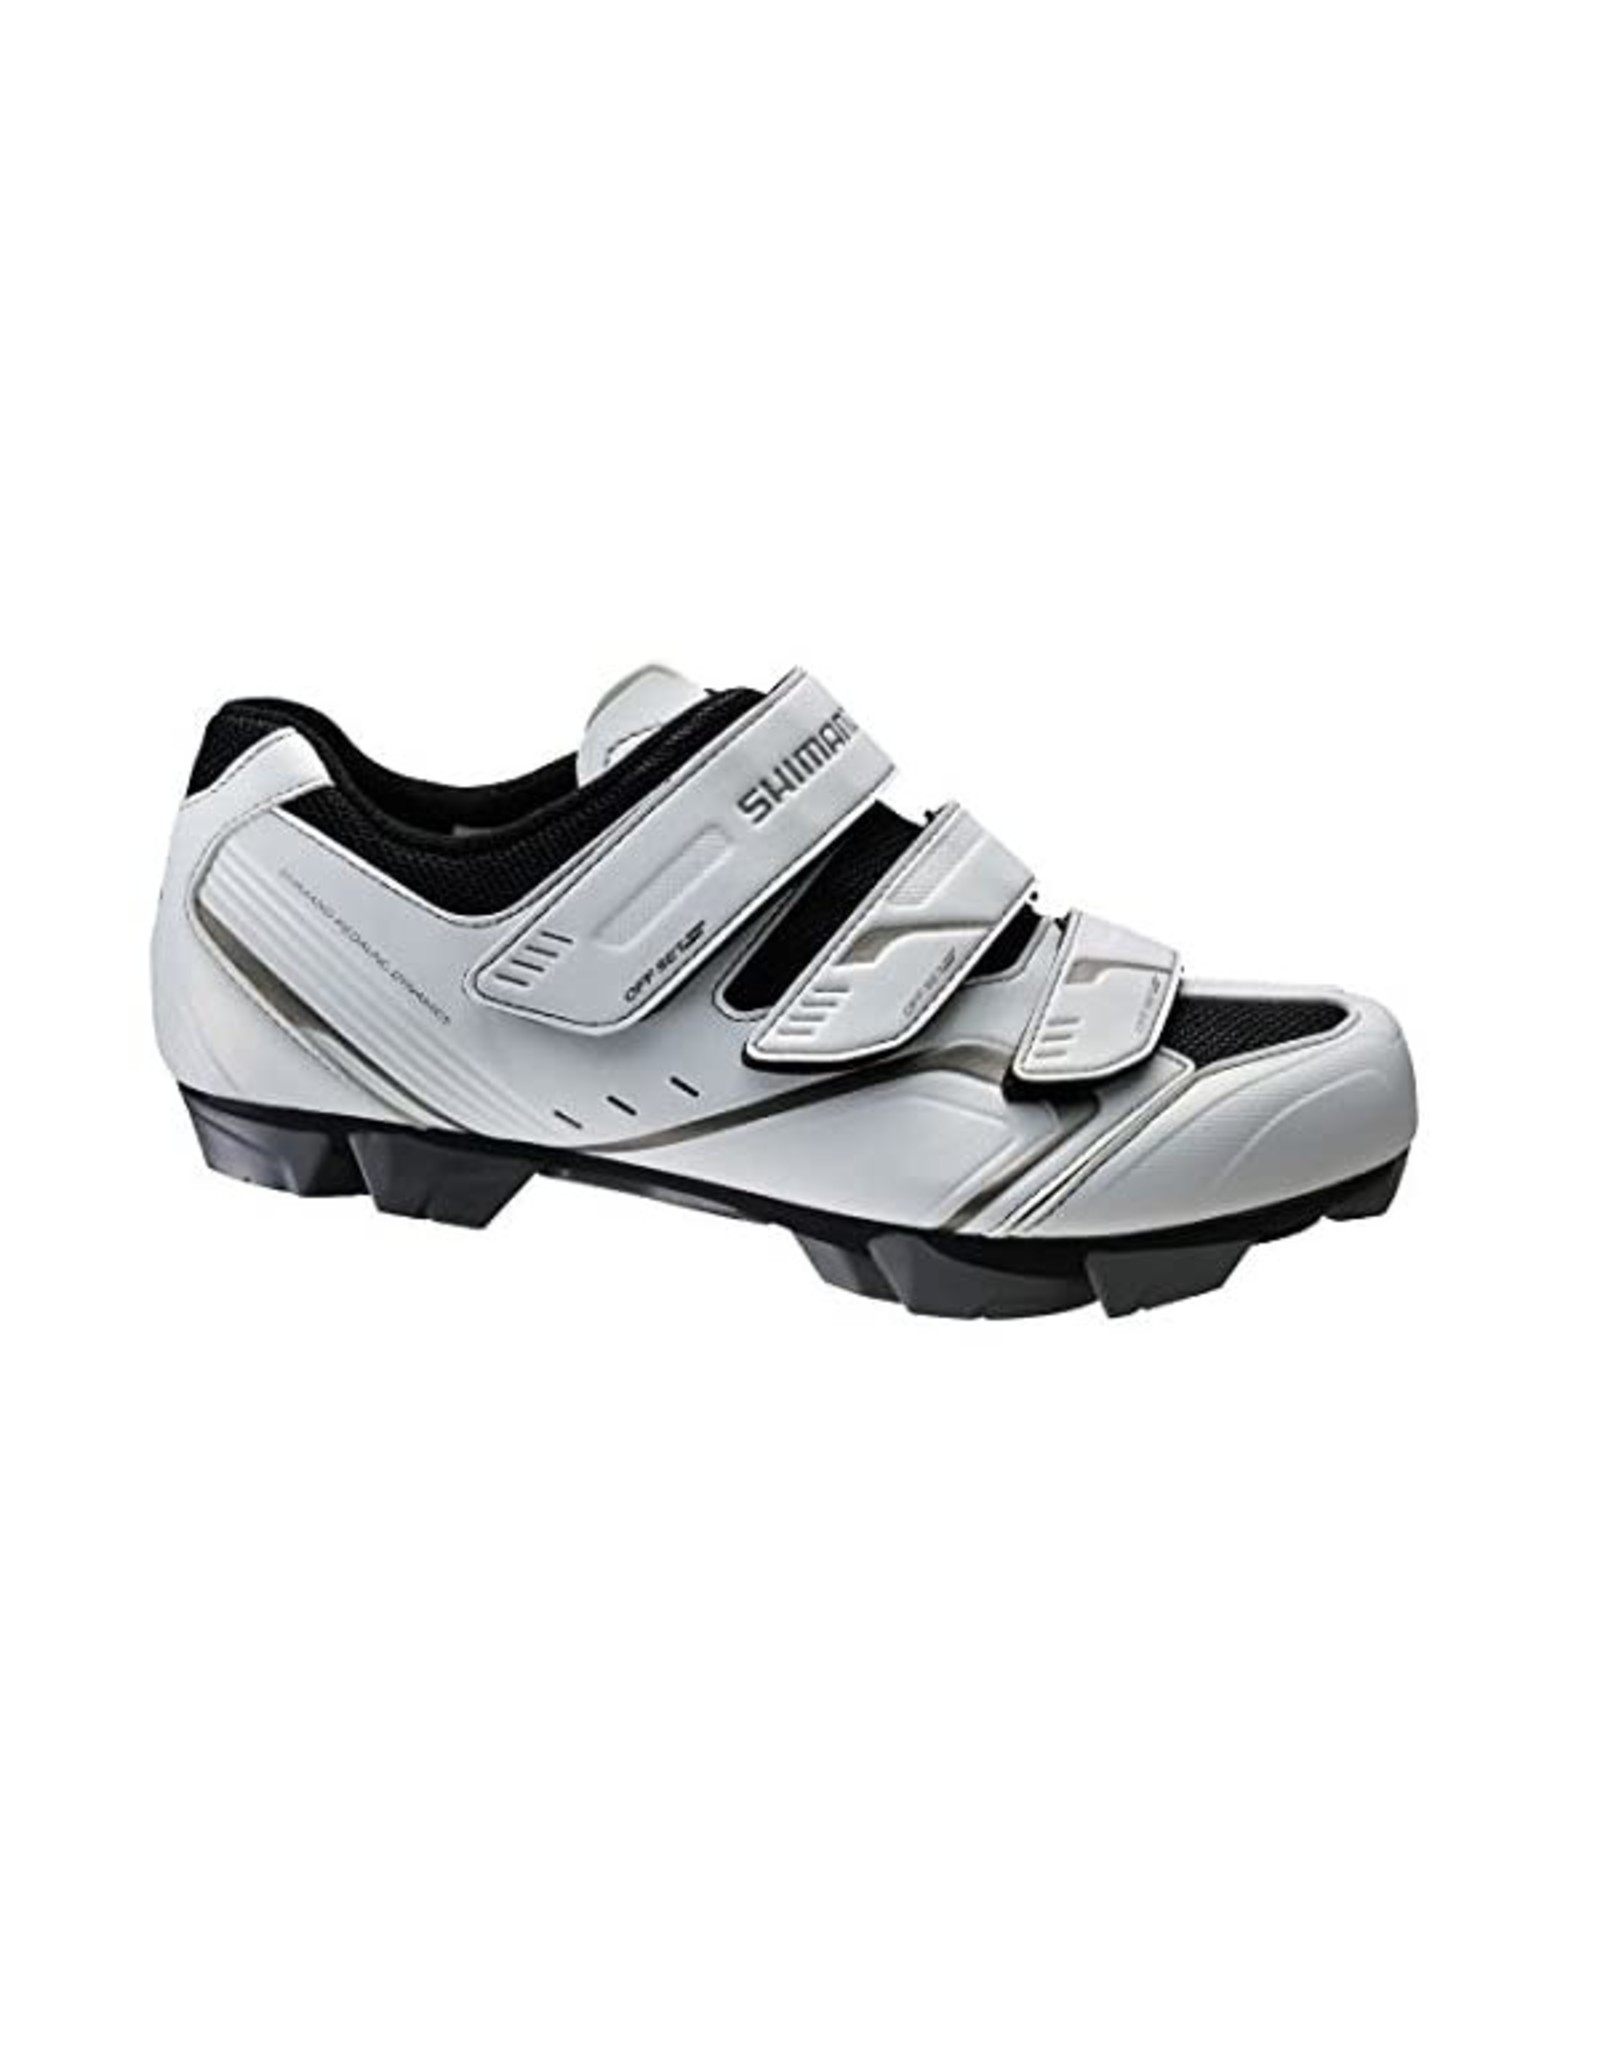 SHIMANO Women's SH-WM52 MTB Shoe (Reg price $124.99)